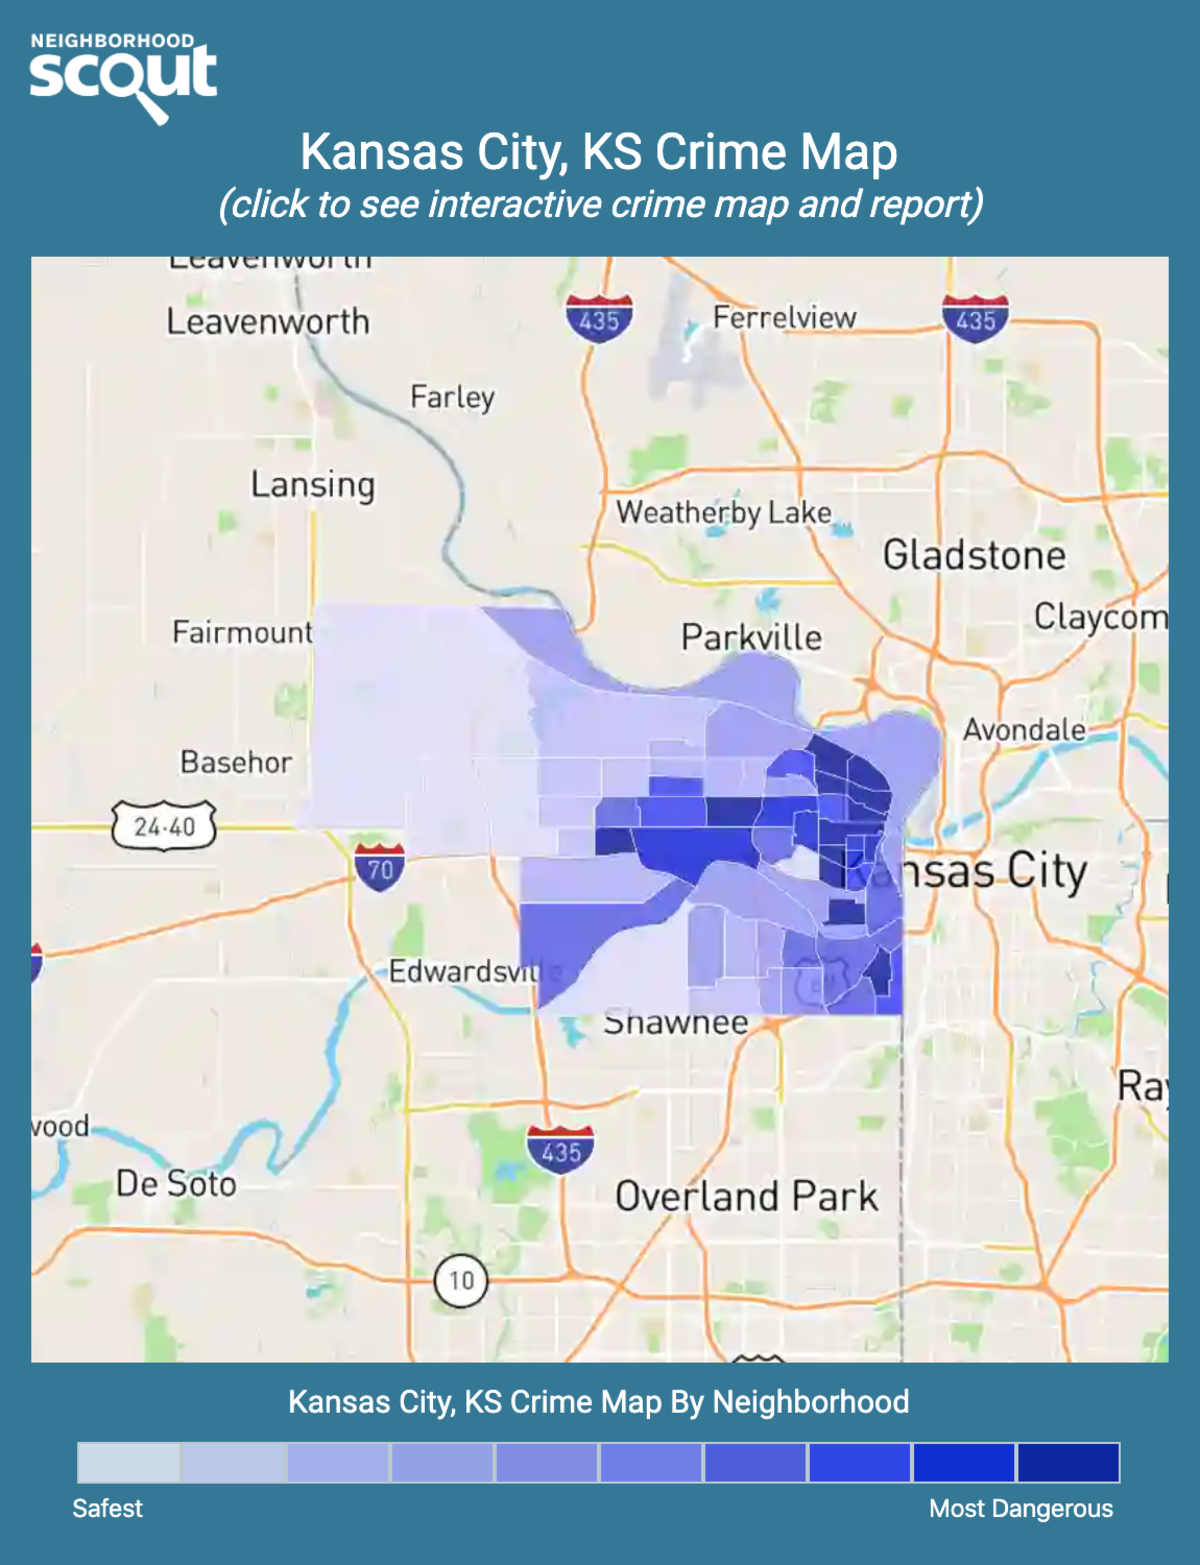 Kansas City, Kansas crime map